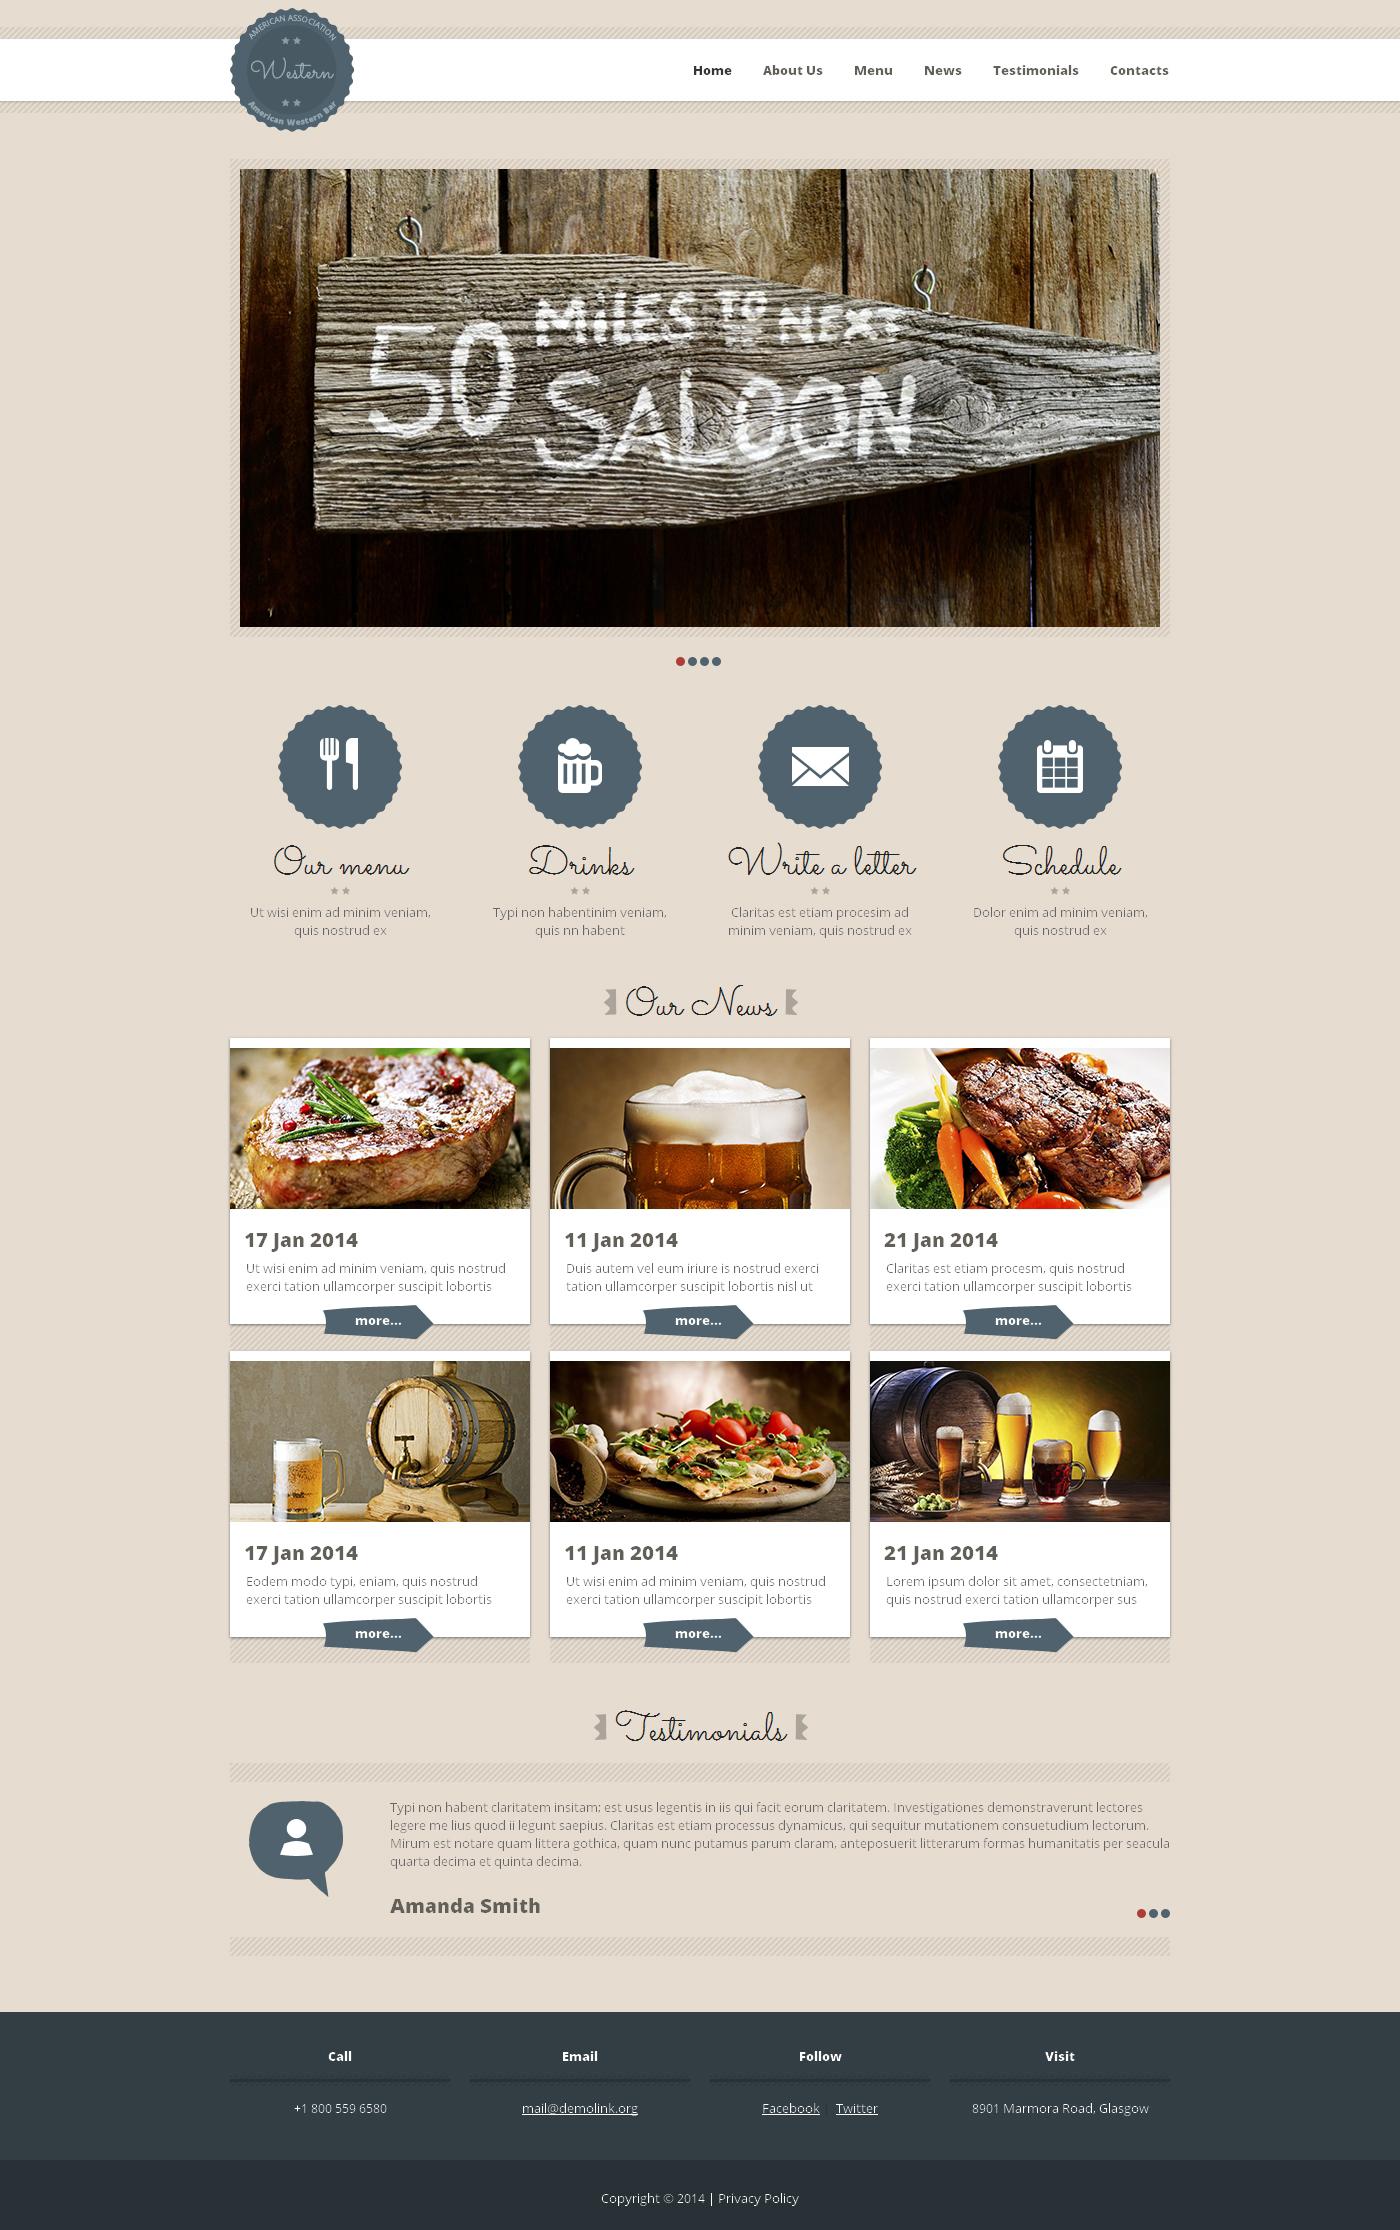 Cafe and Restaurant Responsive Website Template - screenshot